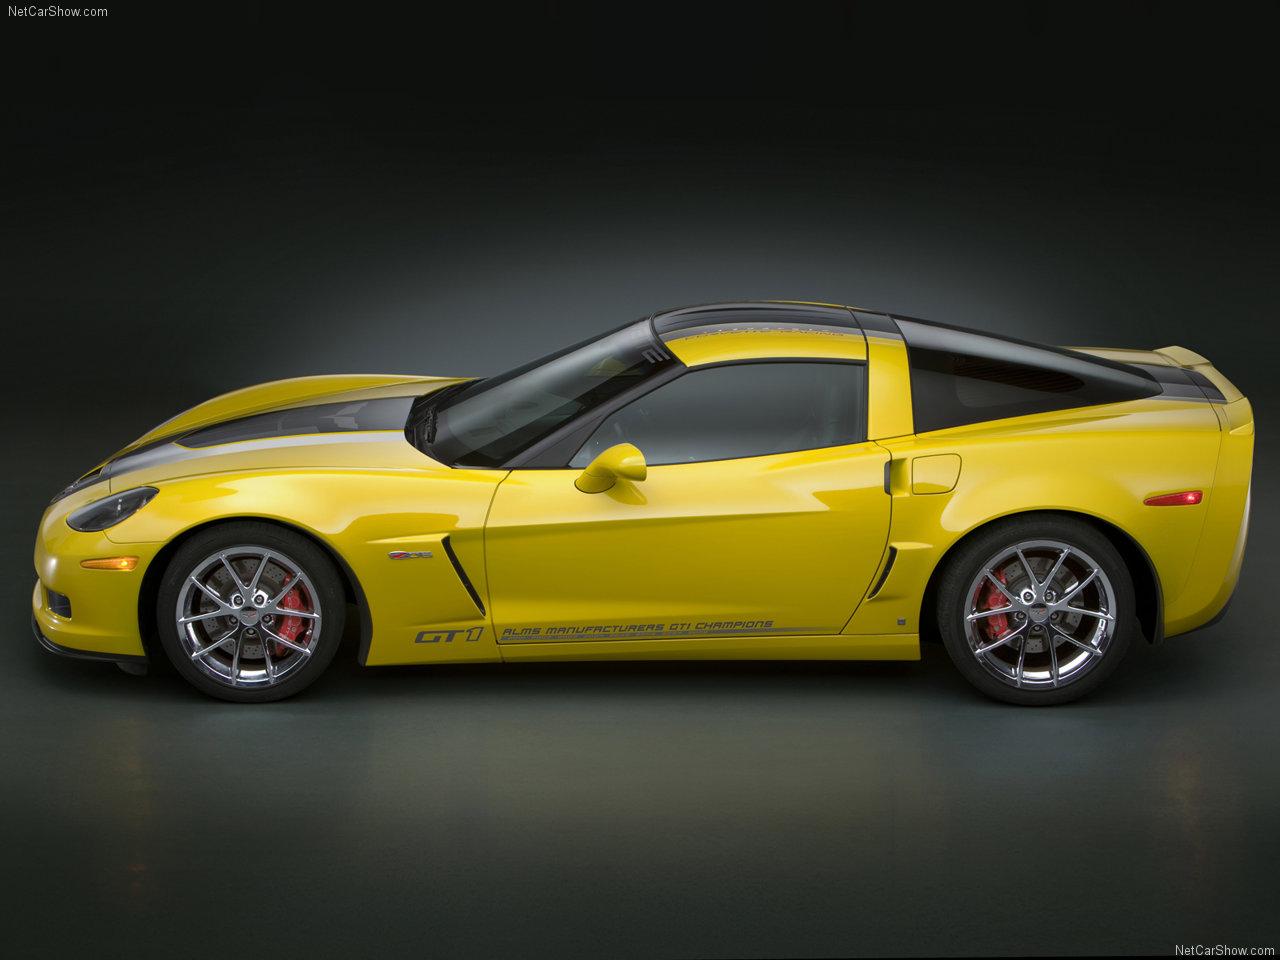 http://3.bp.blogspot.com/-NlIzJxV7emQ/TW9vA_d6O7I/AAAAAAAALng/Qzl81U3Q45I/s1600/Chevrolet-Corvette_GT1_2009_1280x960_wallpaper_02.jpg